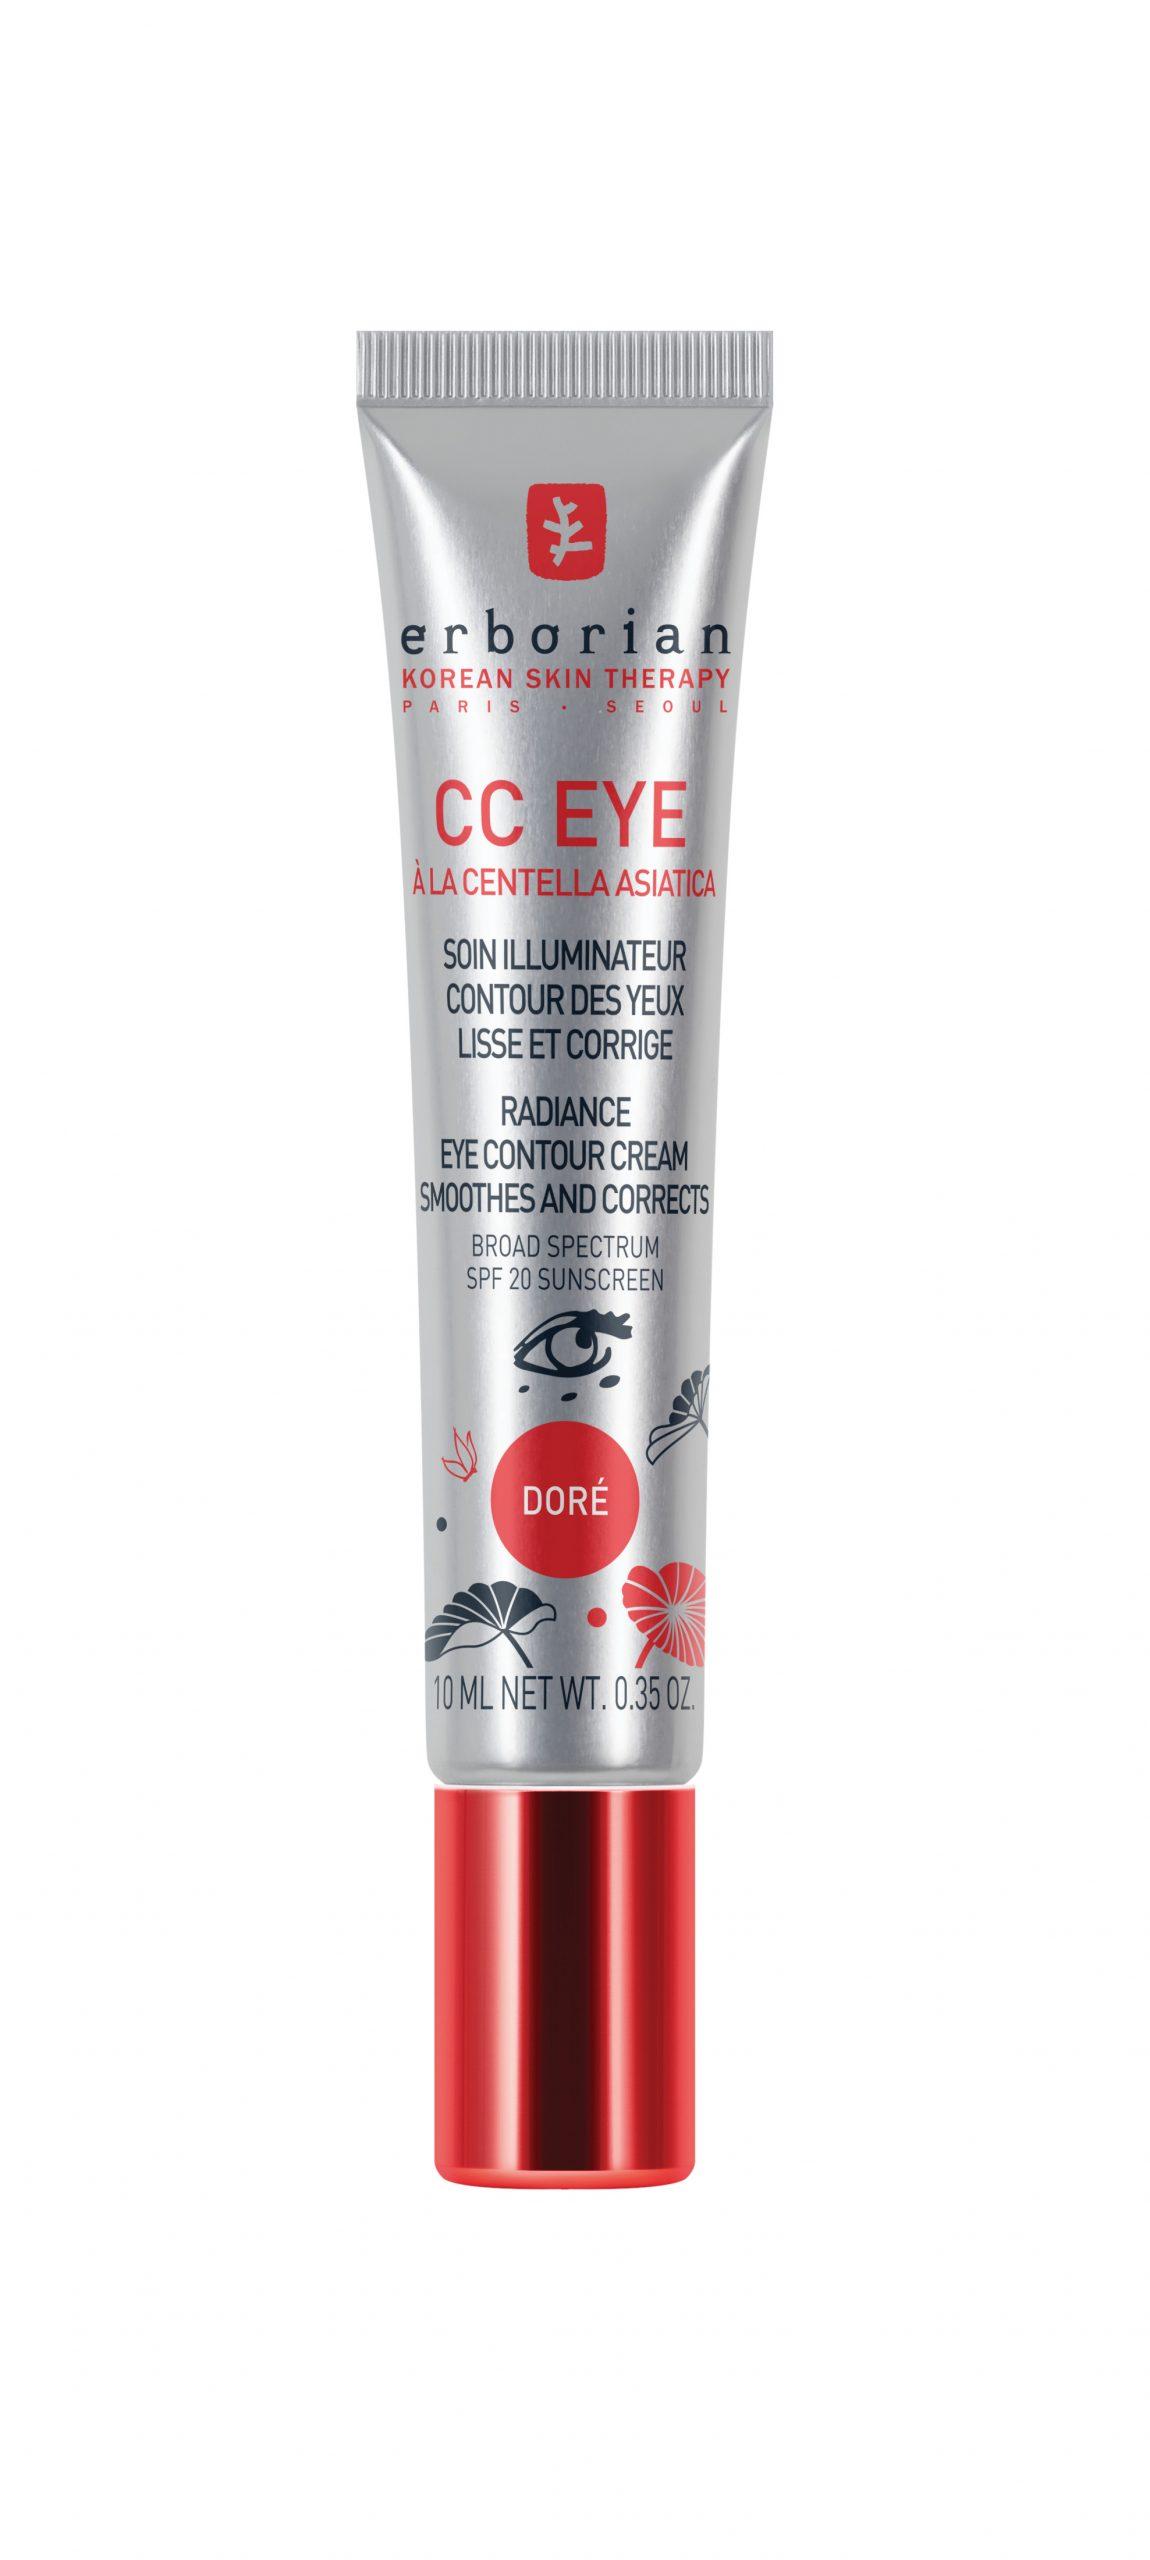 Erborian CC Eye